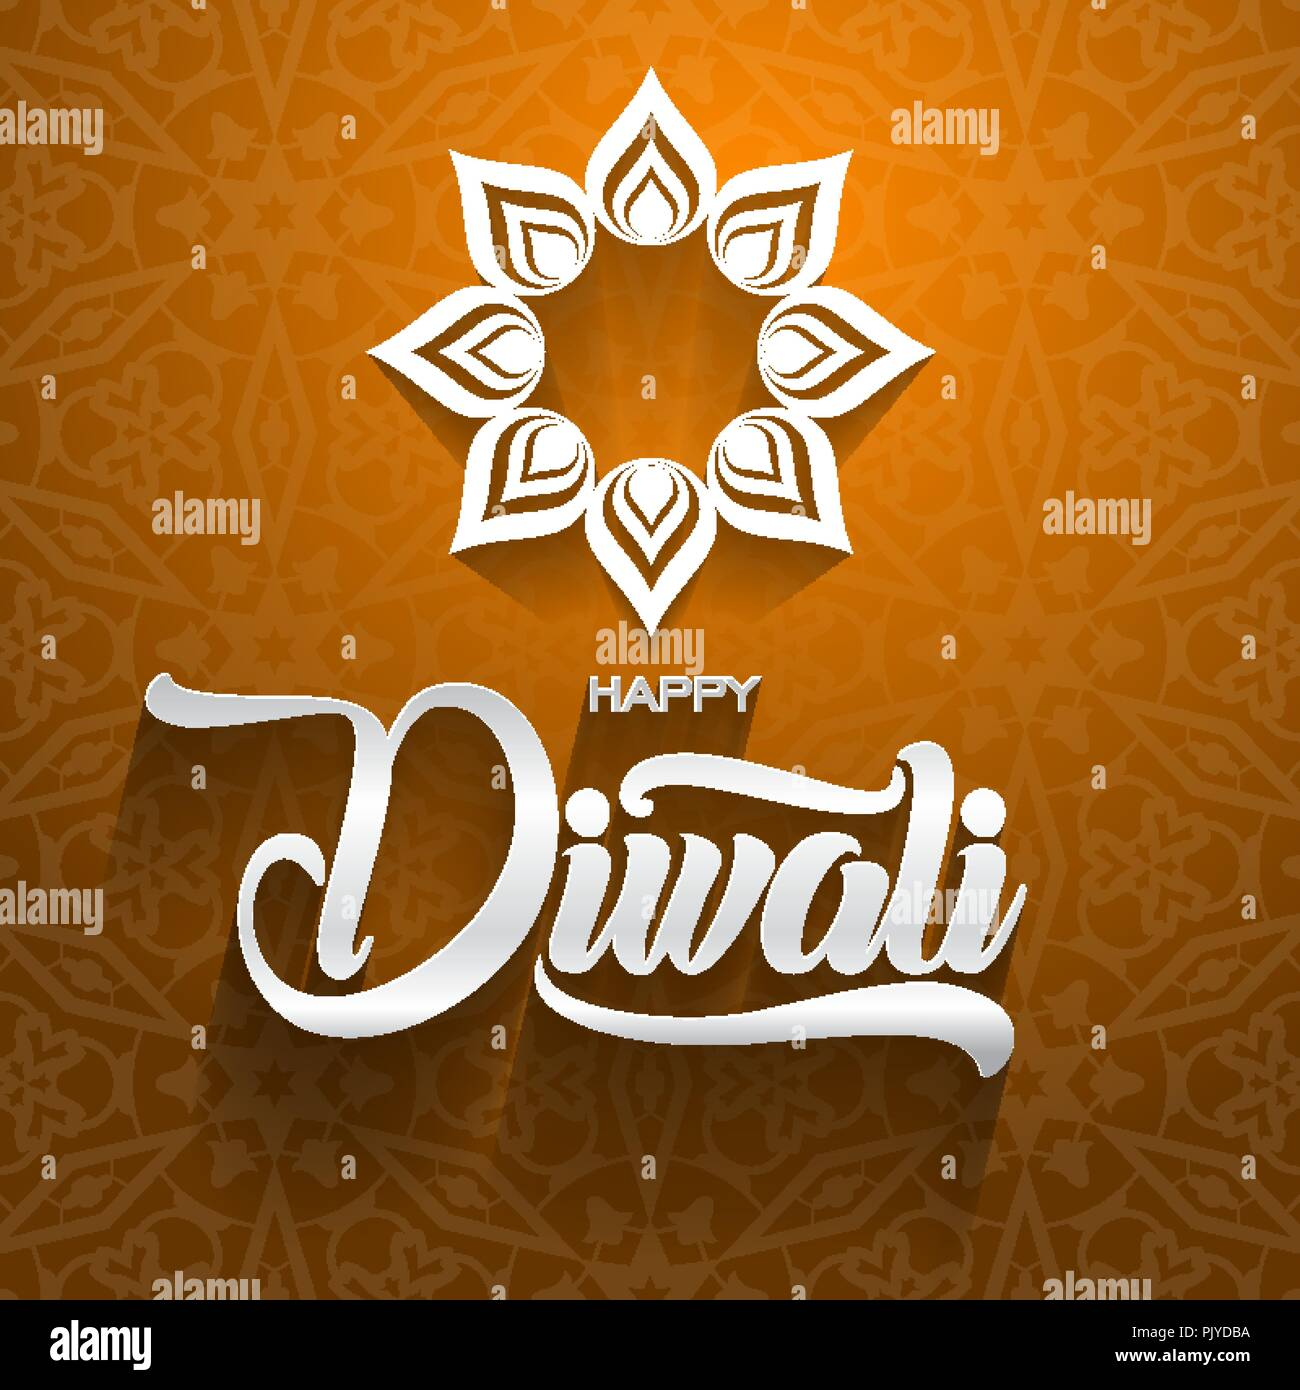 Happy diwali traditional indian festival greeting card with ornament happy diwali traditional indian festival greeting card with ornament background vector illustration m4hsunfo